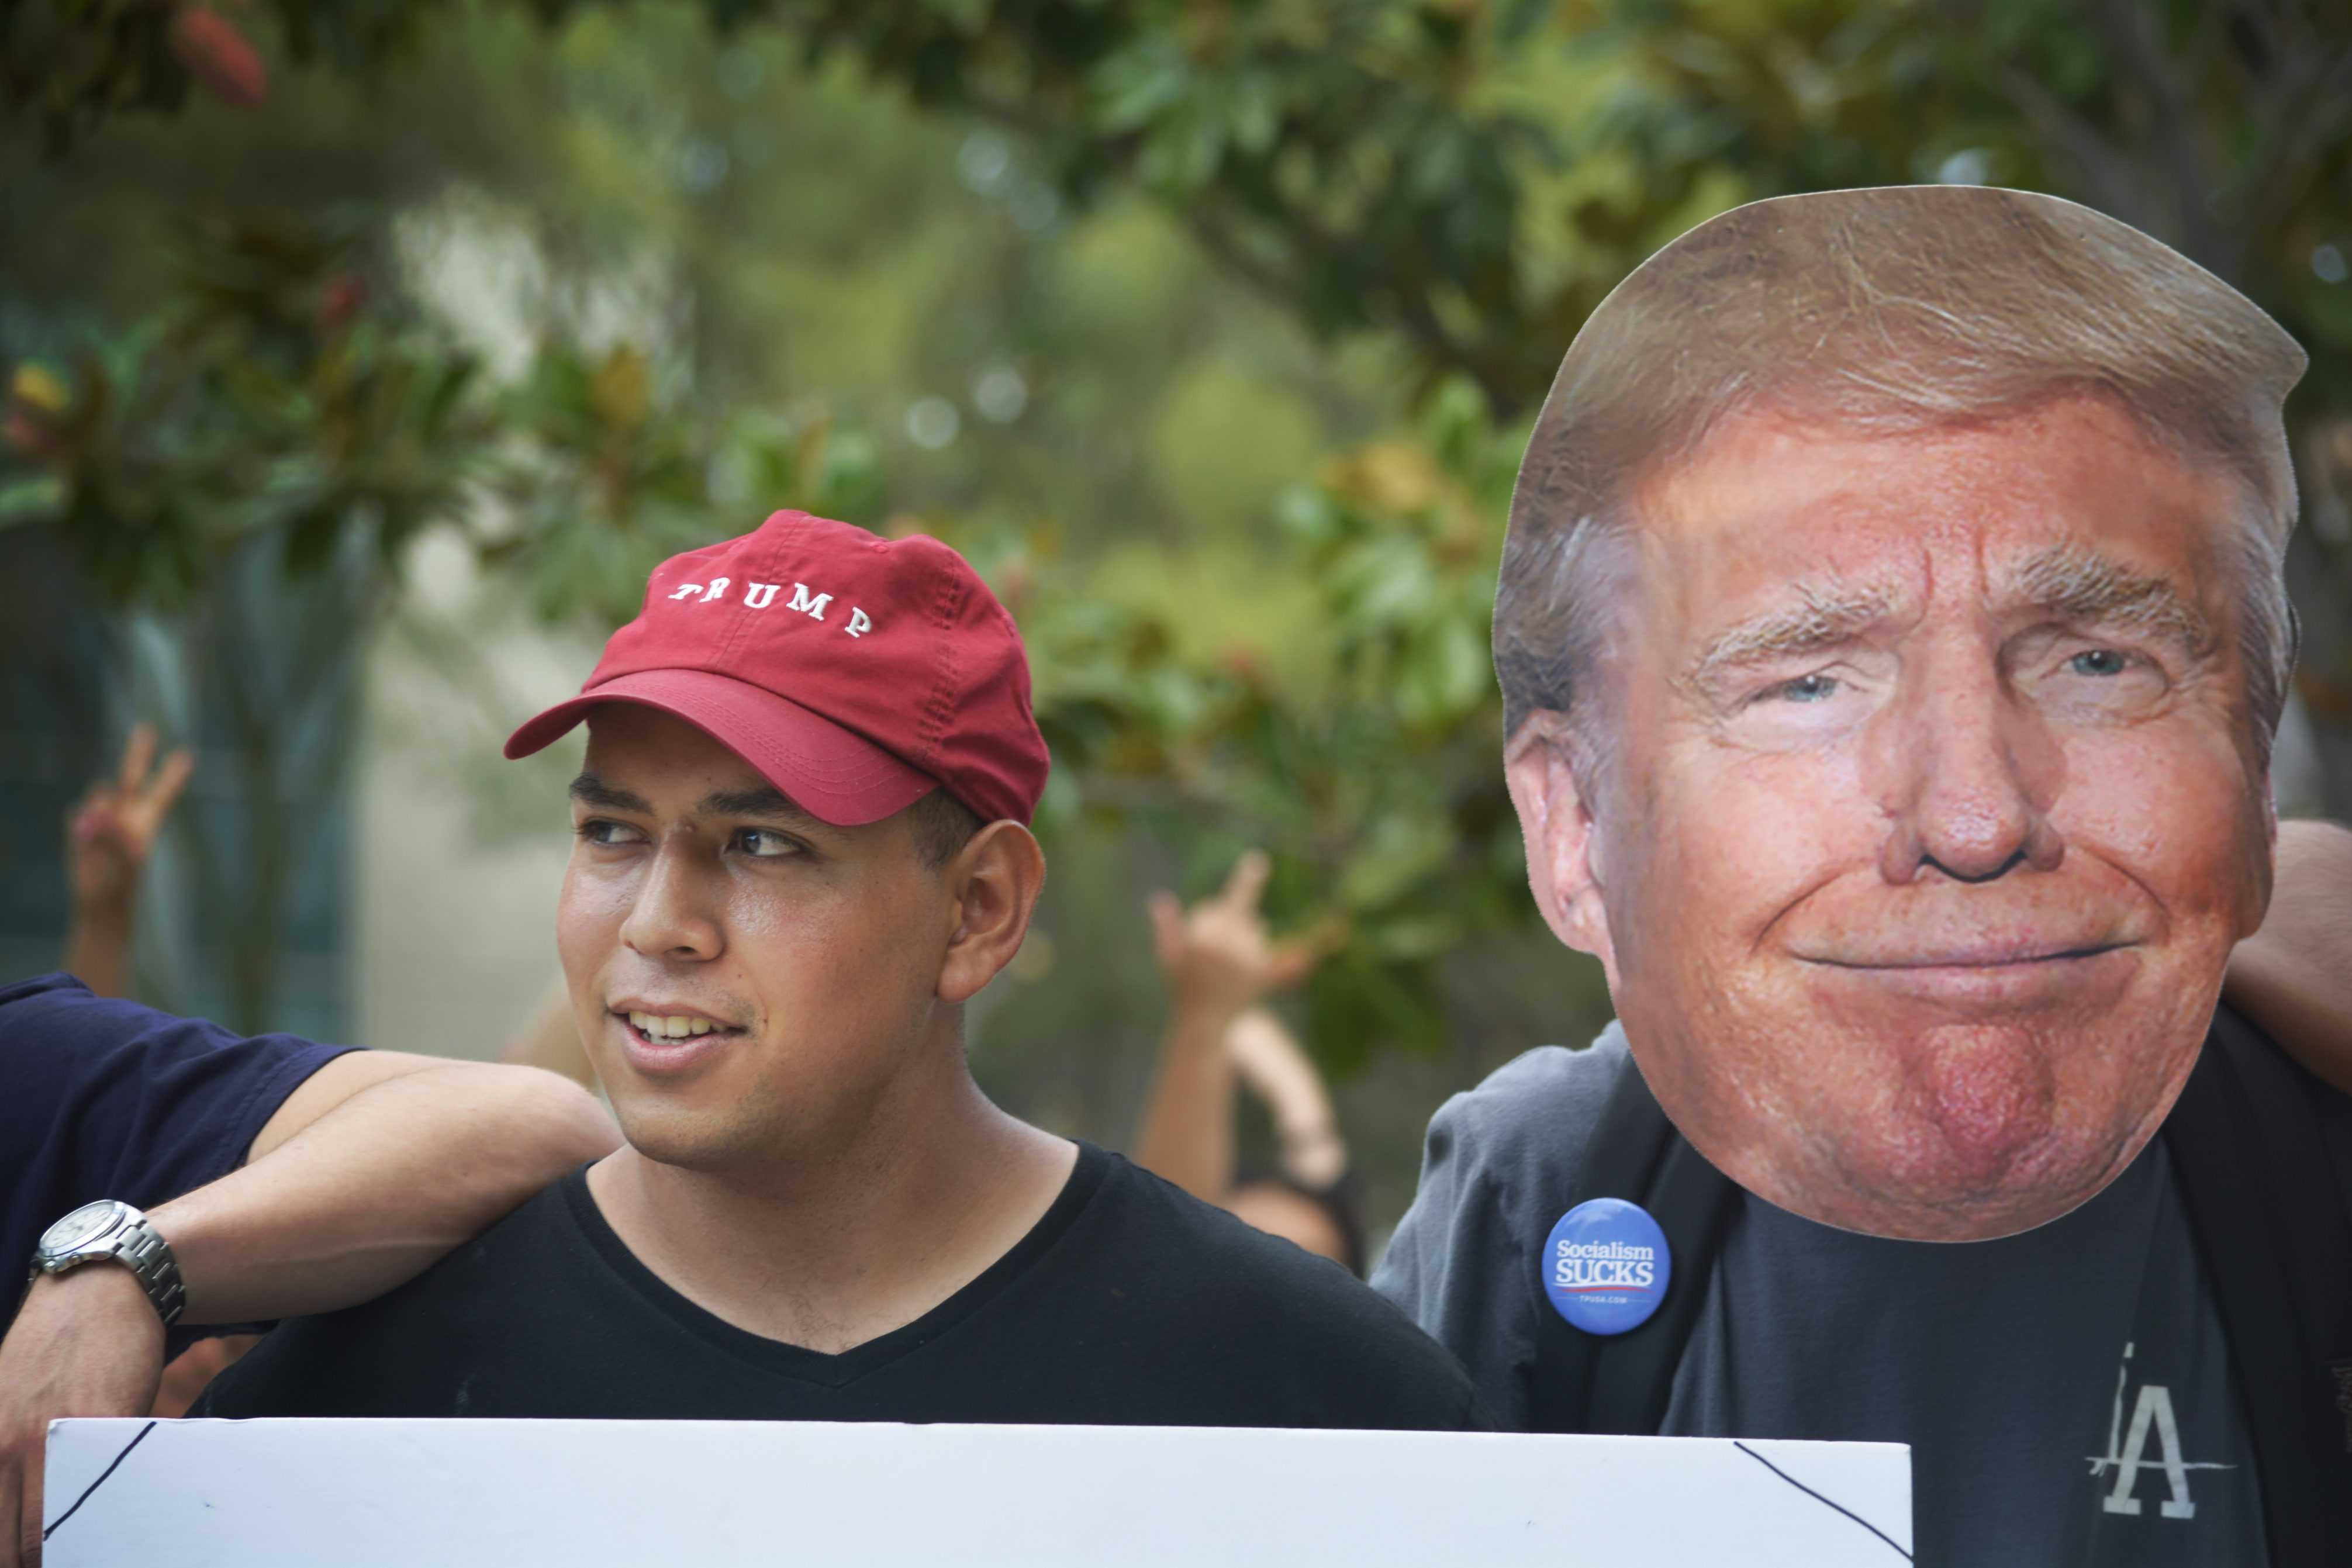 Man wears donald trump mask